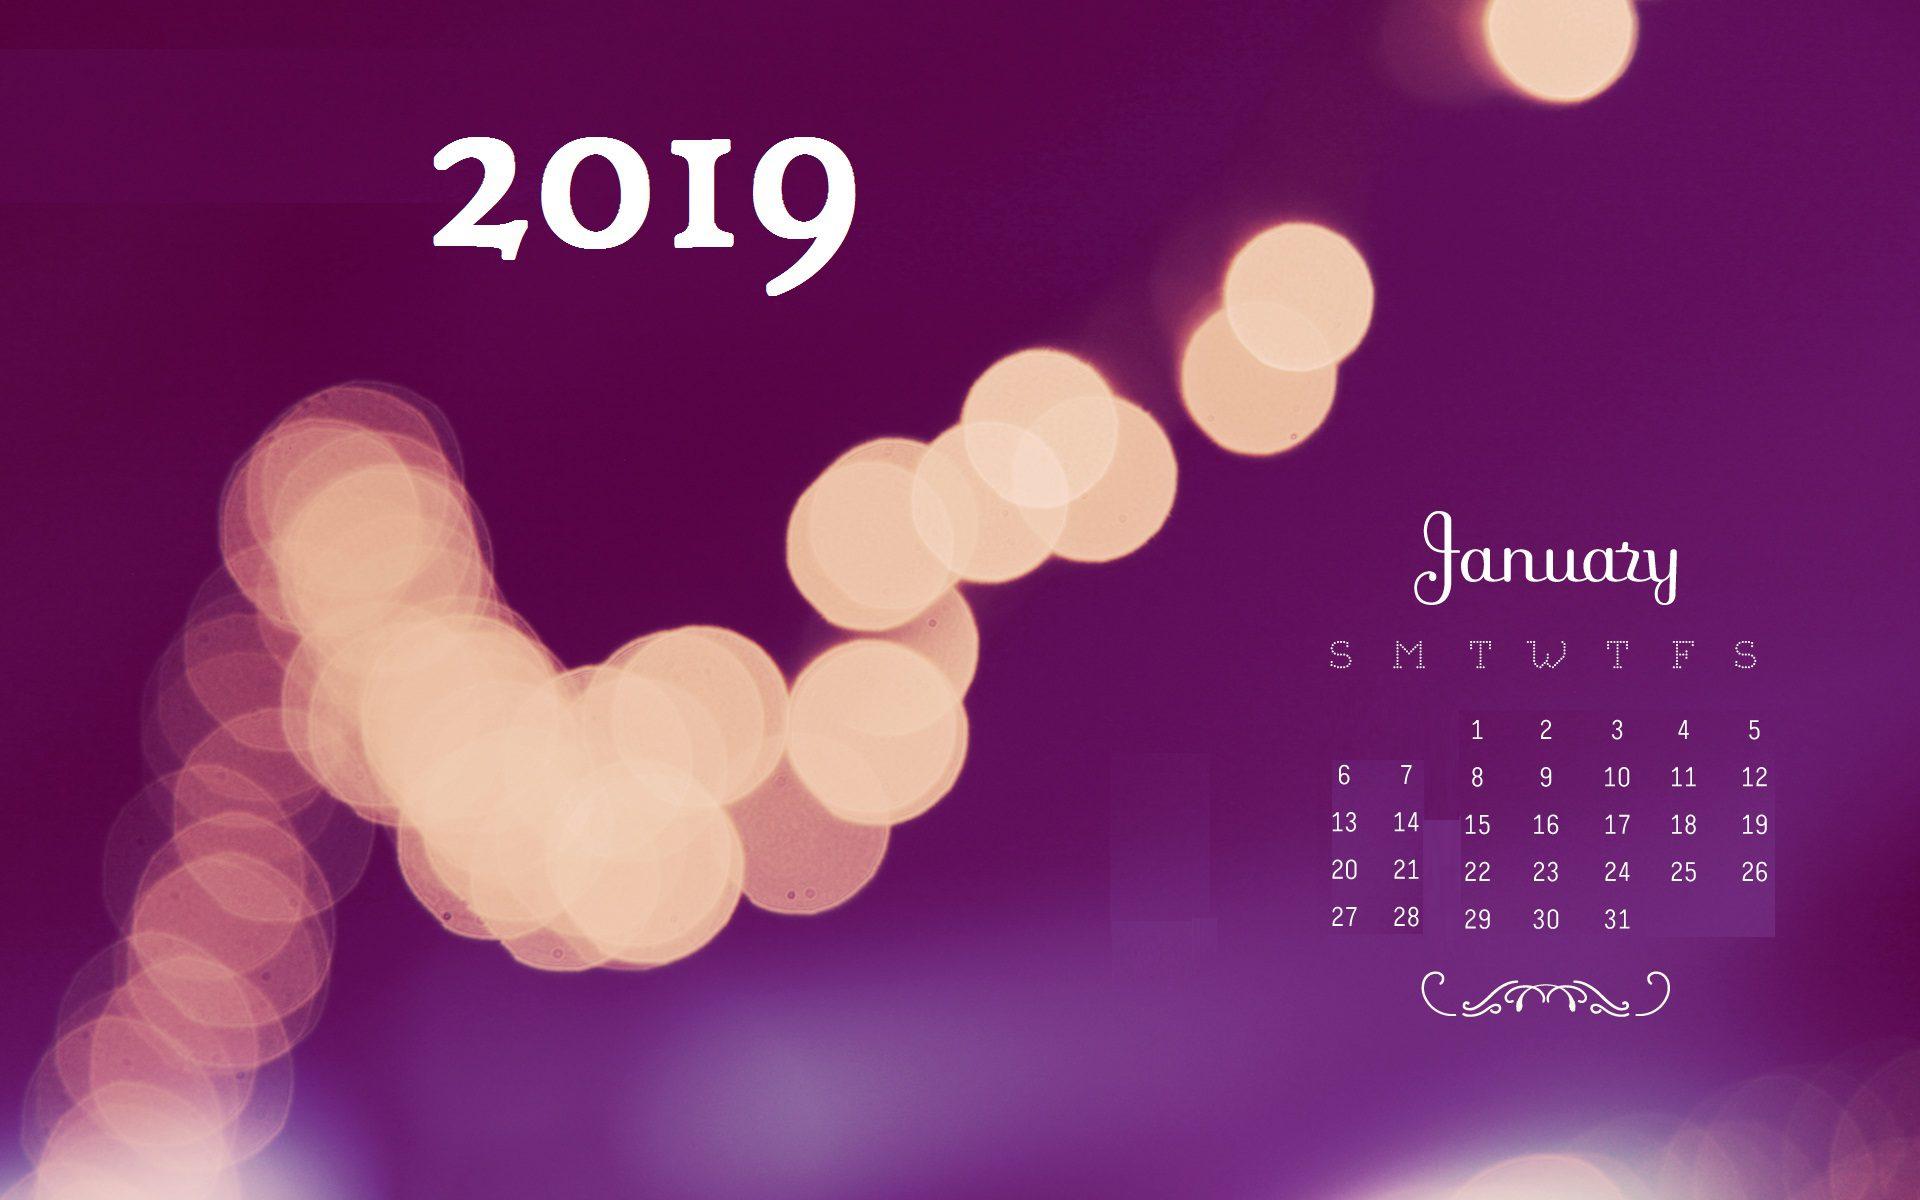 Desktop Wallpaper January 2019 Calendar